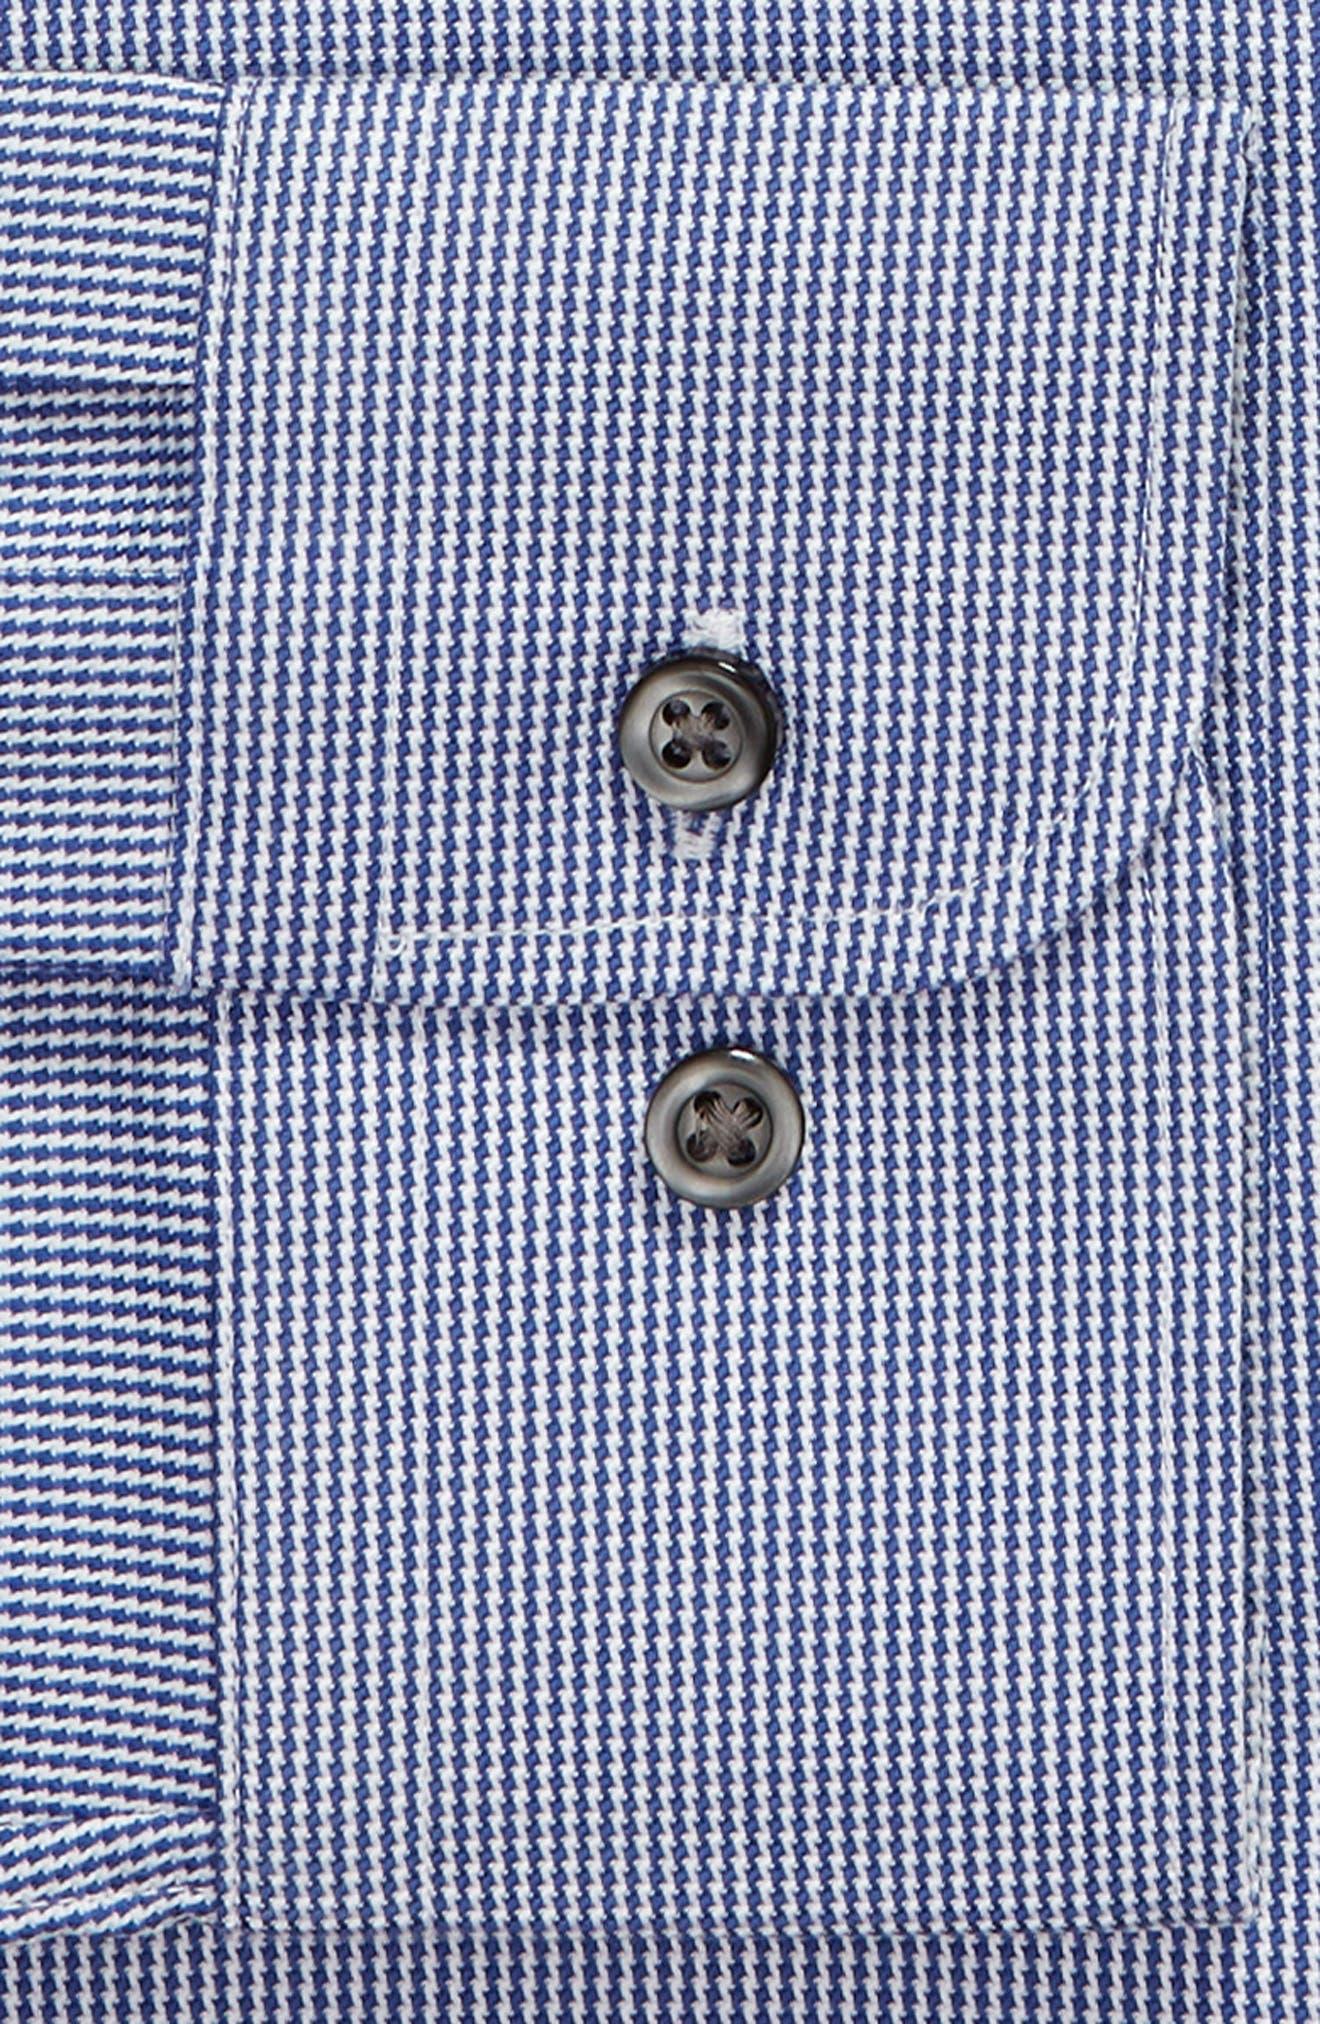 Trim Fit Non-Iron Solid Dress Shirt,                             Alternate thumbnail 6, color,                             NAVY DRESS